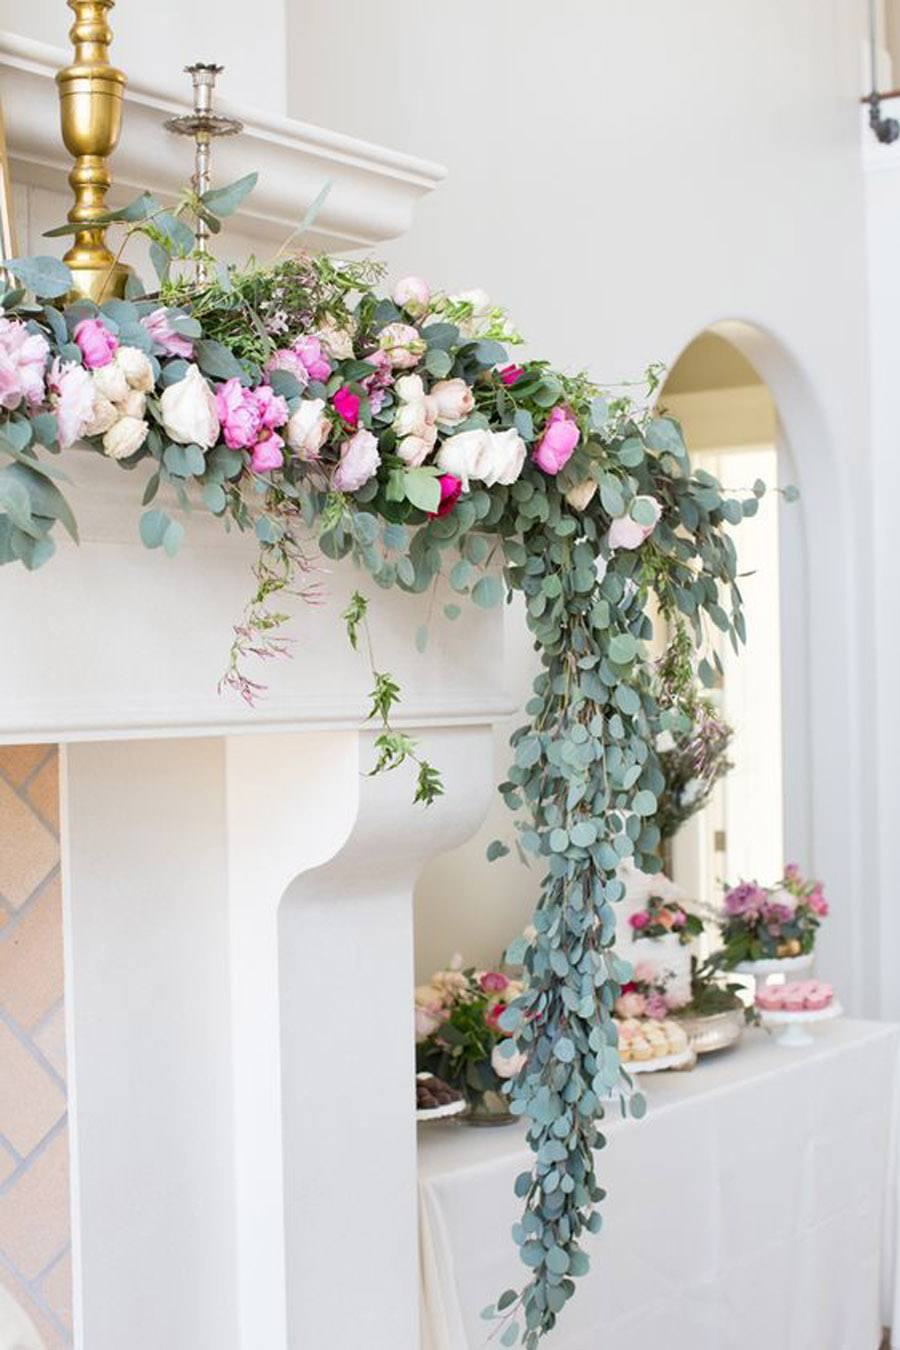 INSPIRACIÓN: CHIMENEAS chimeneas-bodas-invierno